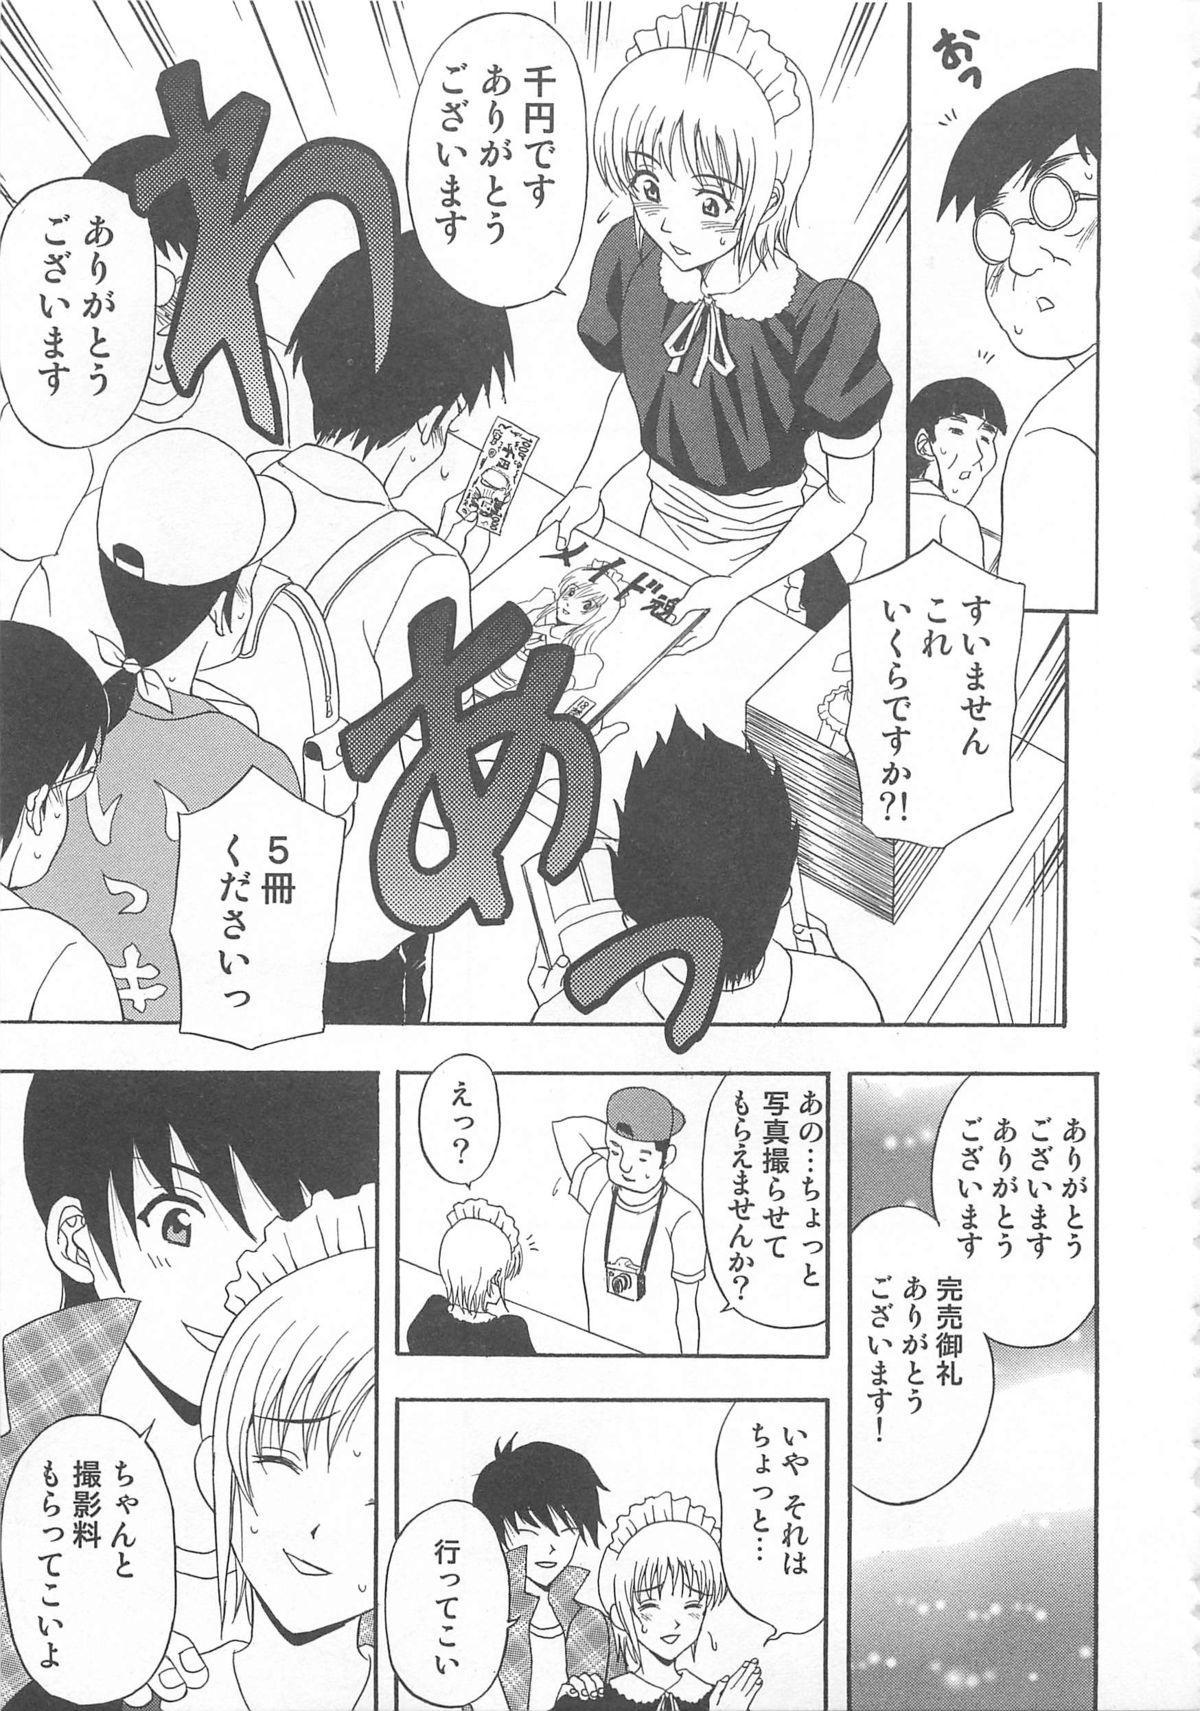 Otokonoko HEAVEN Vol. 02 Dokidoki Chikan Taiken 73